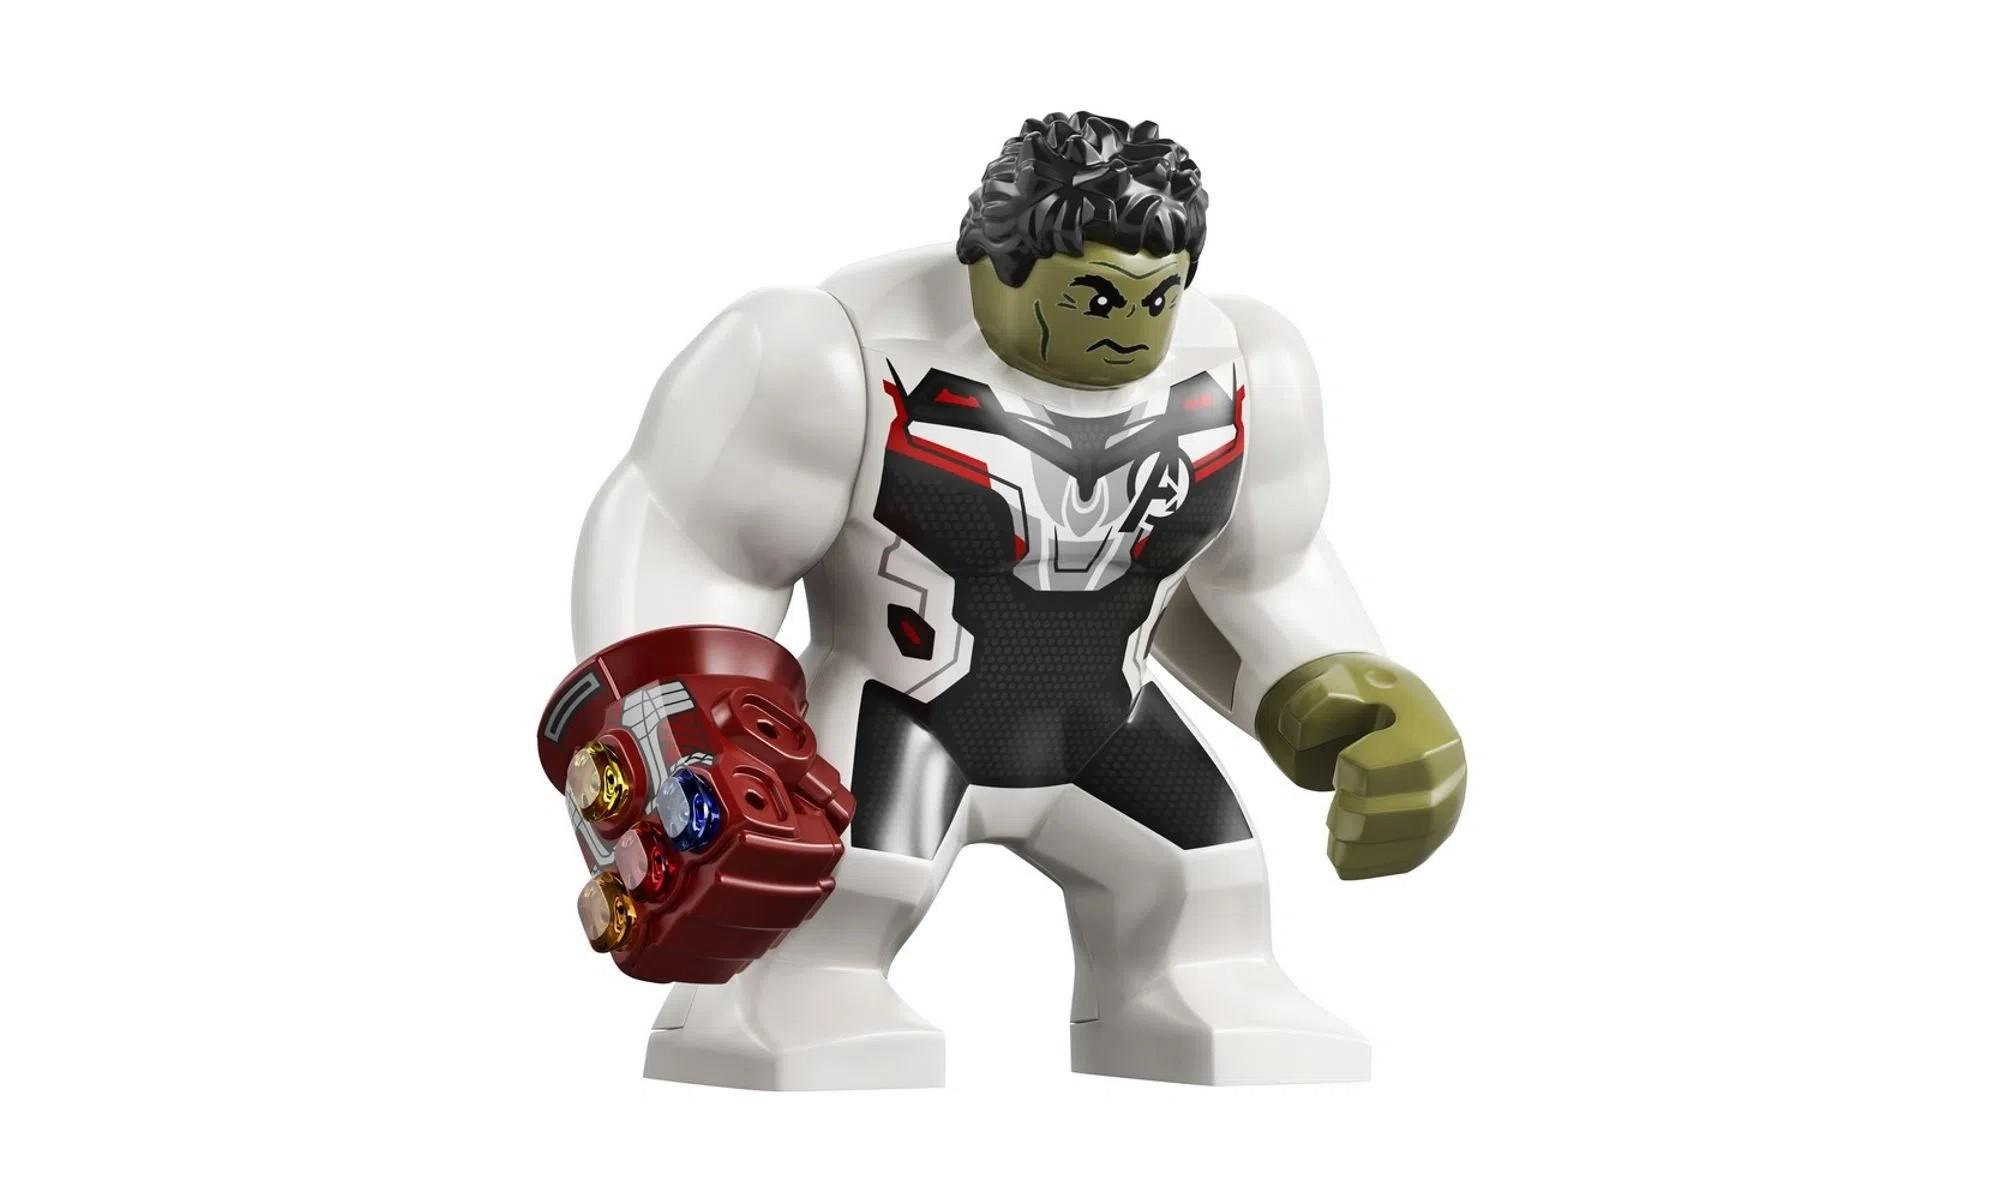 LEGO Super Heroes Marvel Resgate de helicóptero dos Vingadores Hulk 76144